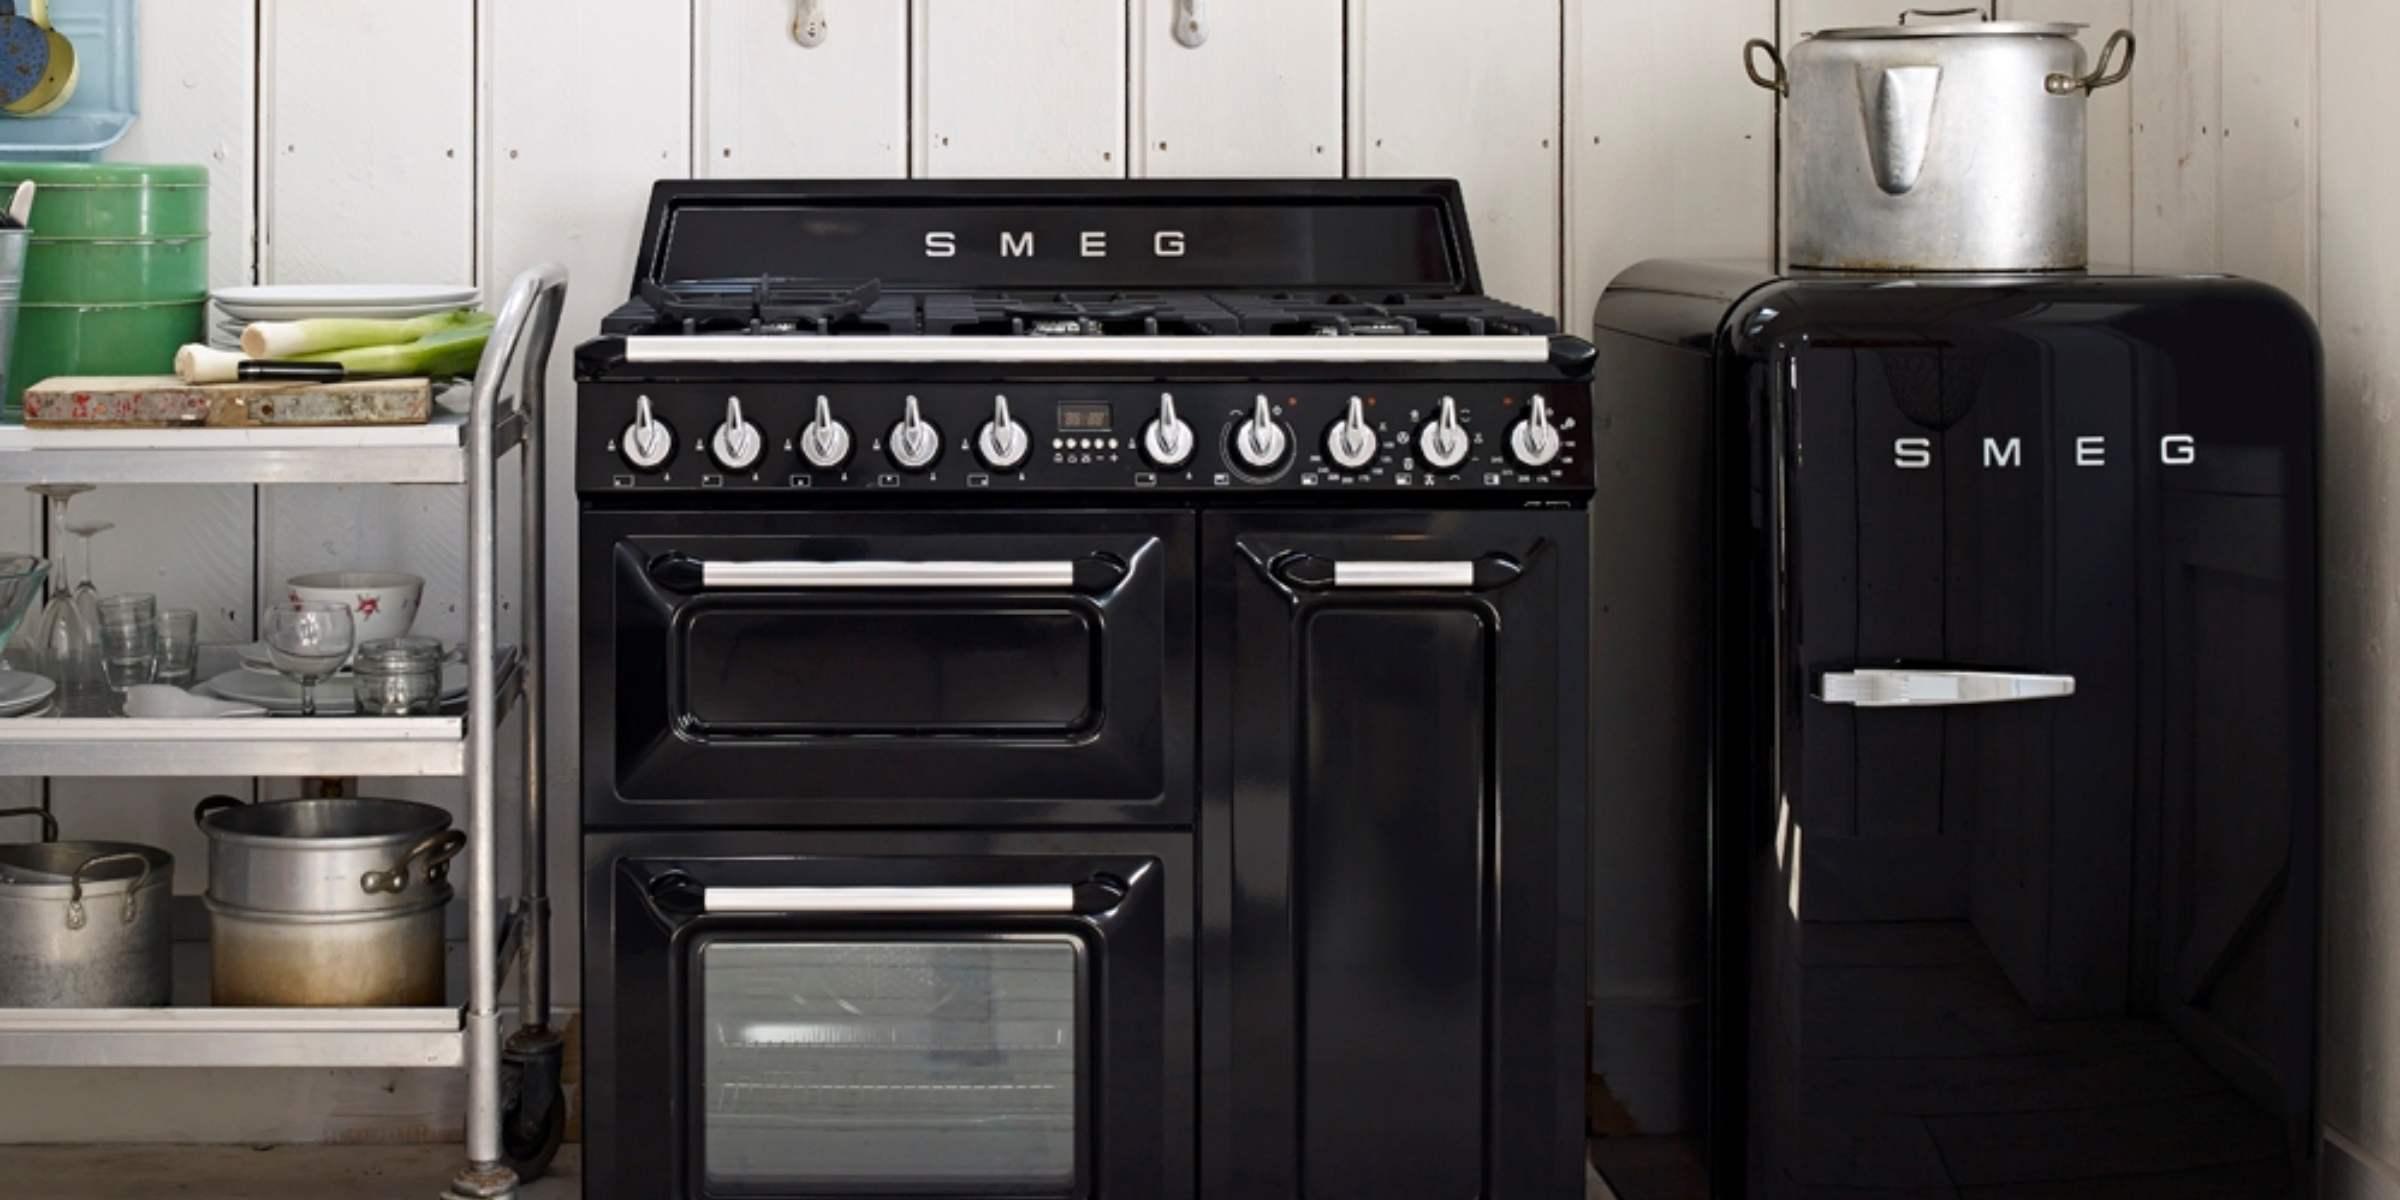 SMEG Kitchen Appliances COD Kitchen Appliances